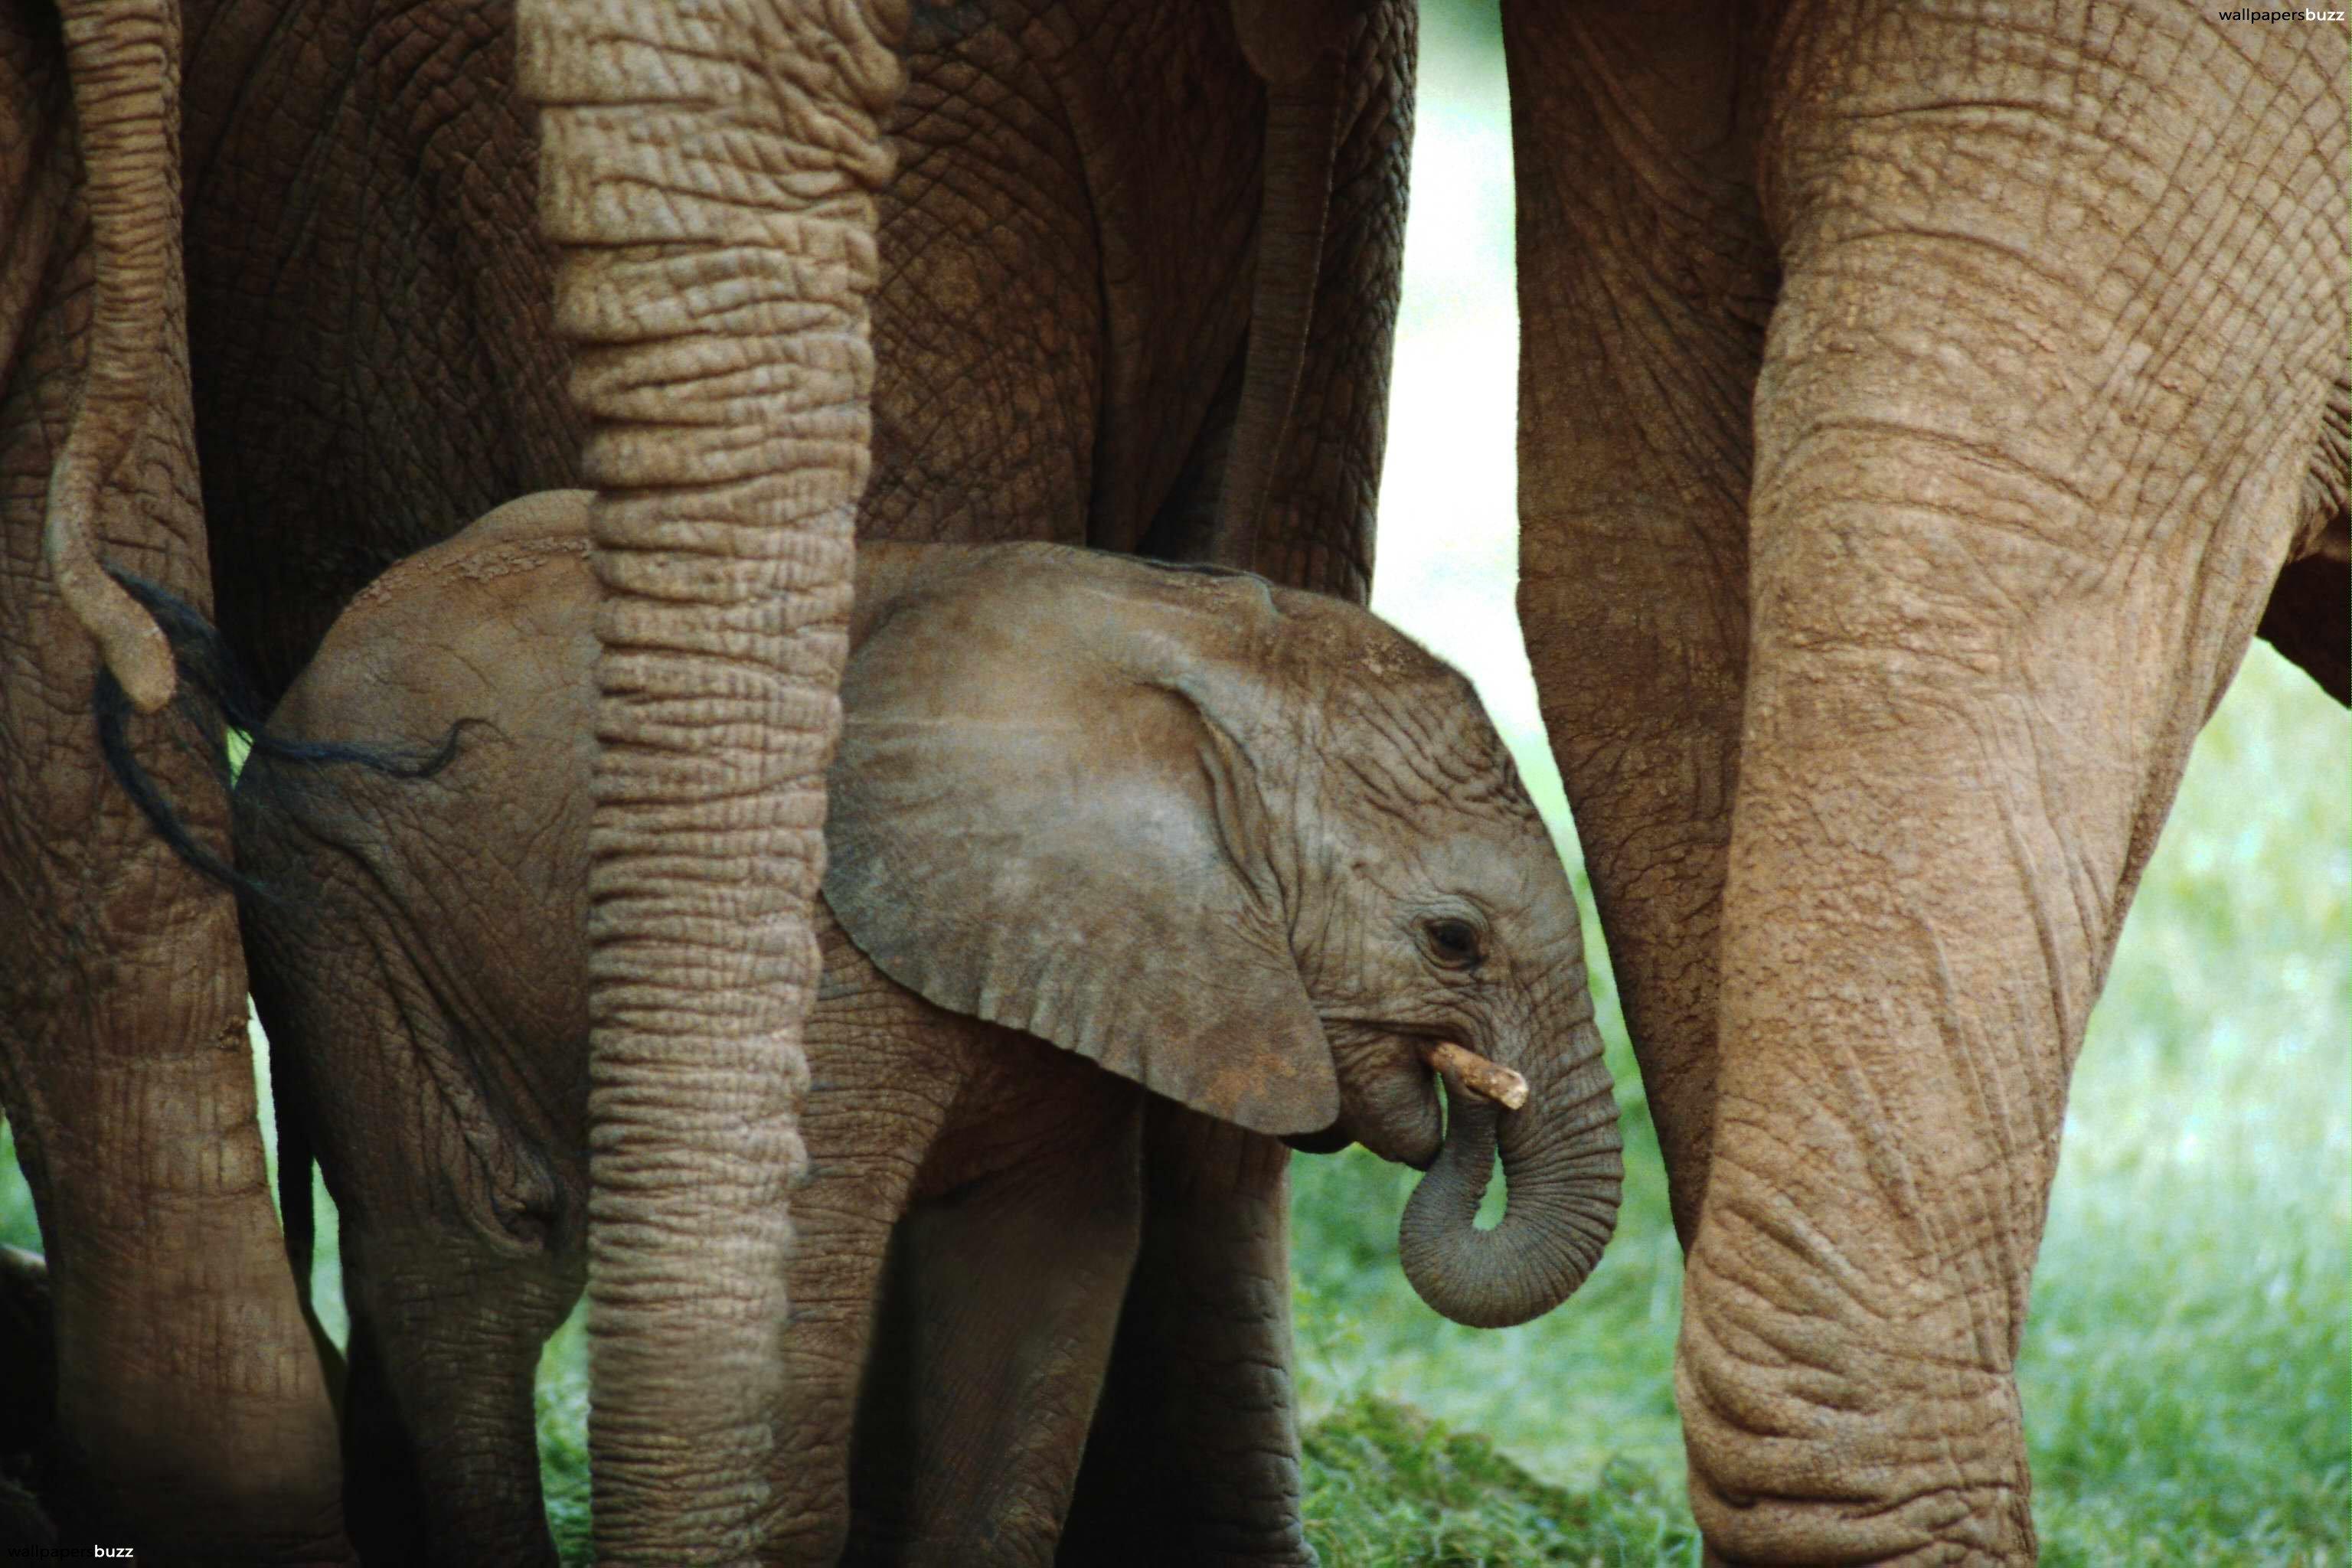 Cute elephant wallpapers wallpapersafari - Baby elephant wallpaper ...